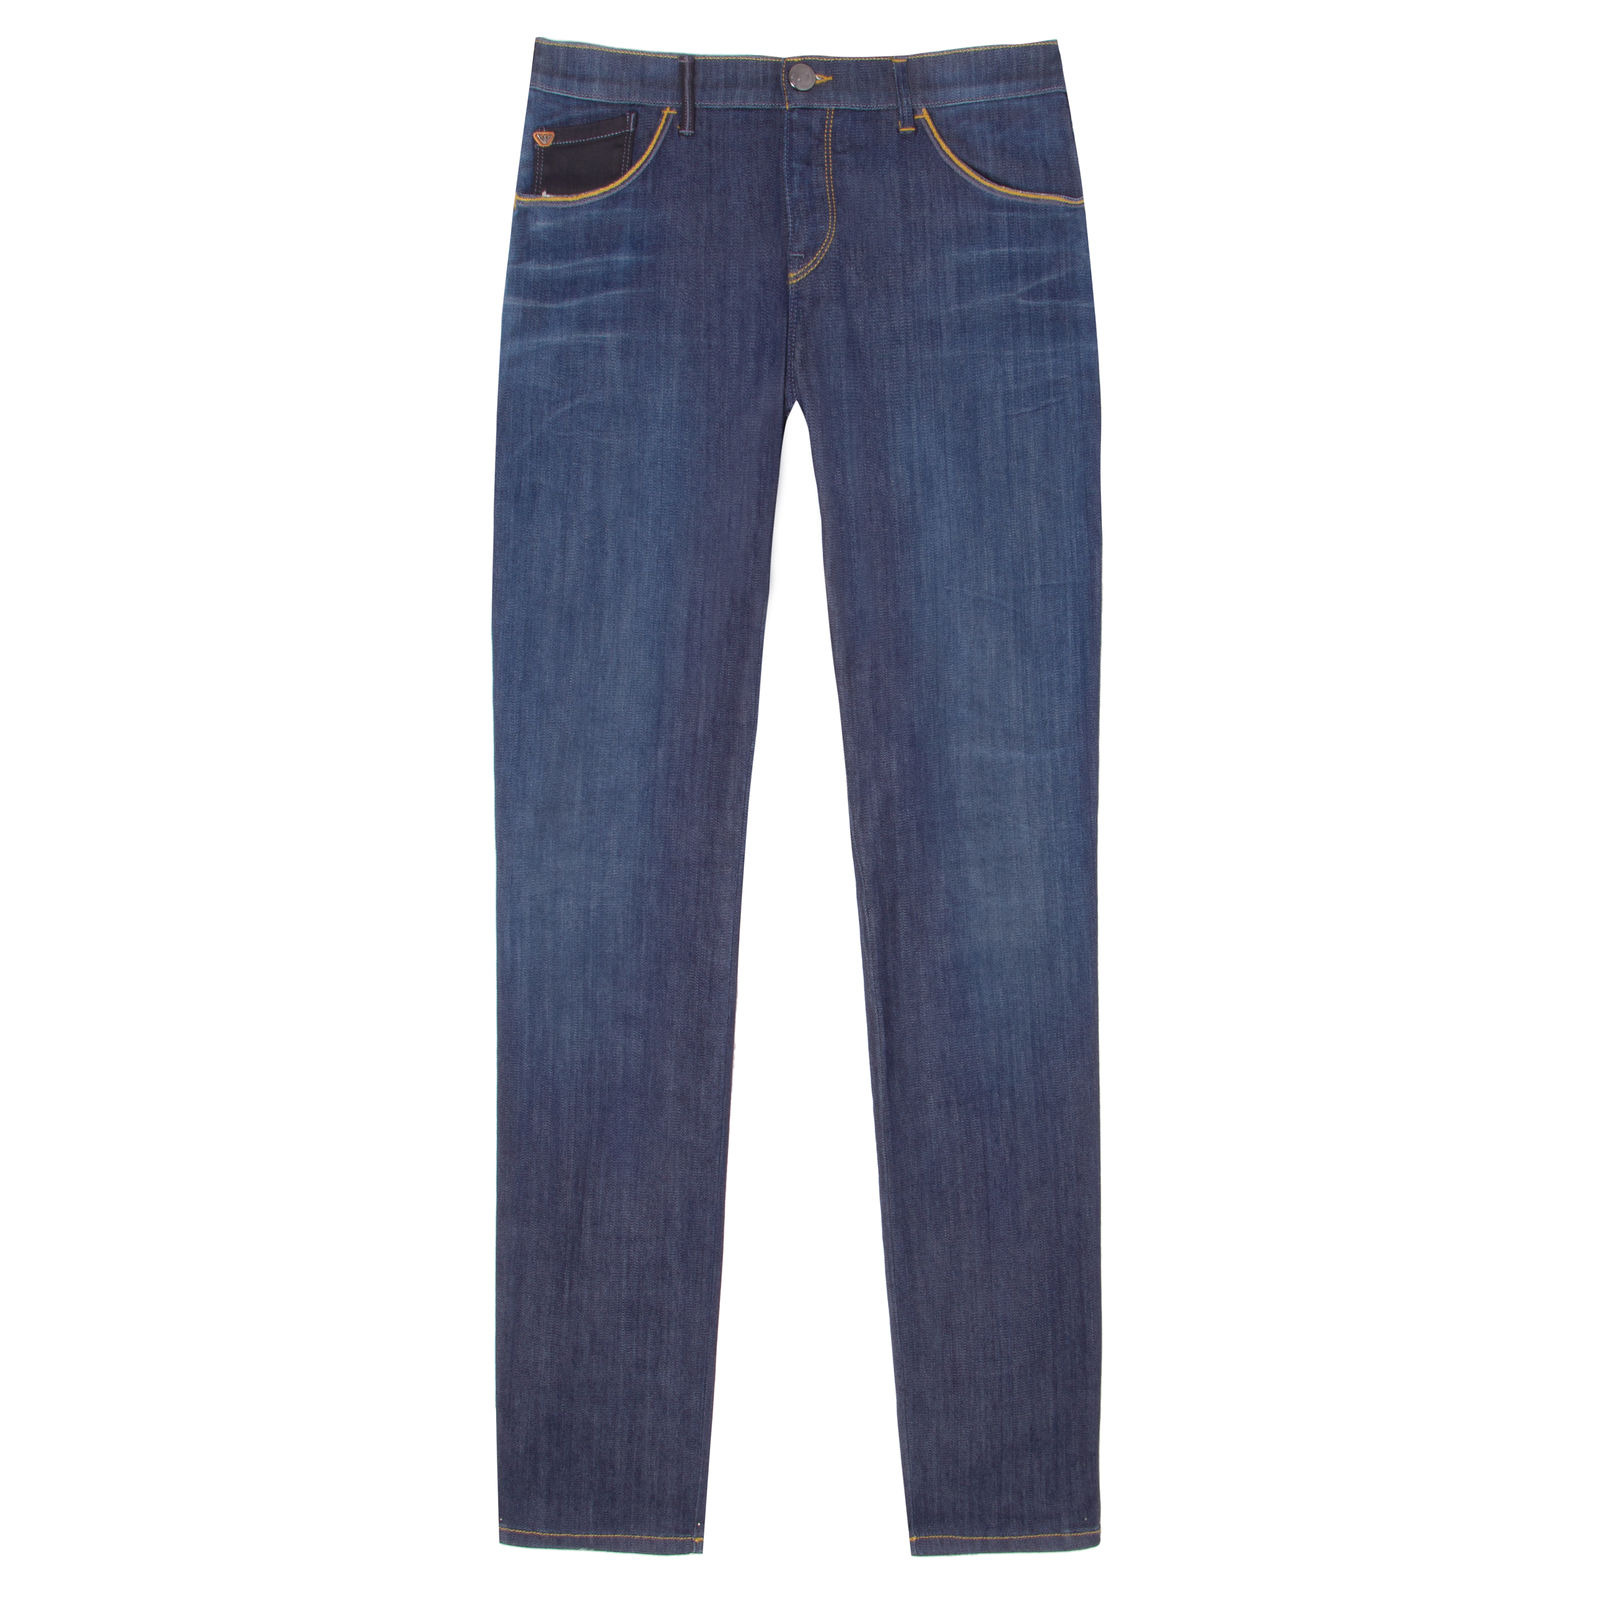 Calça Jeans Skinny Pesponto Armani Jeans